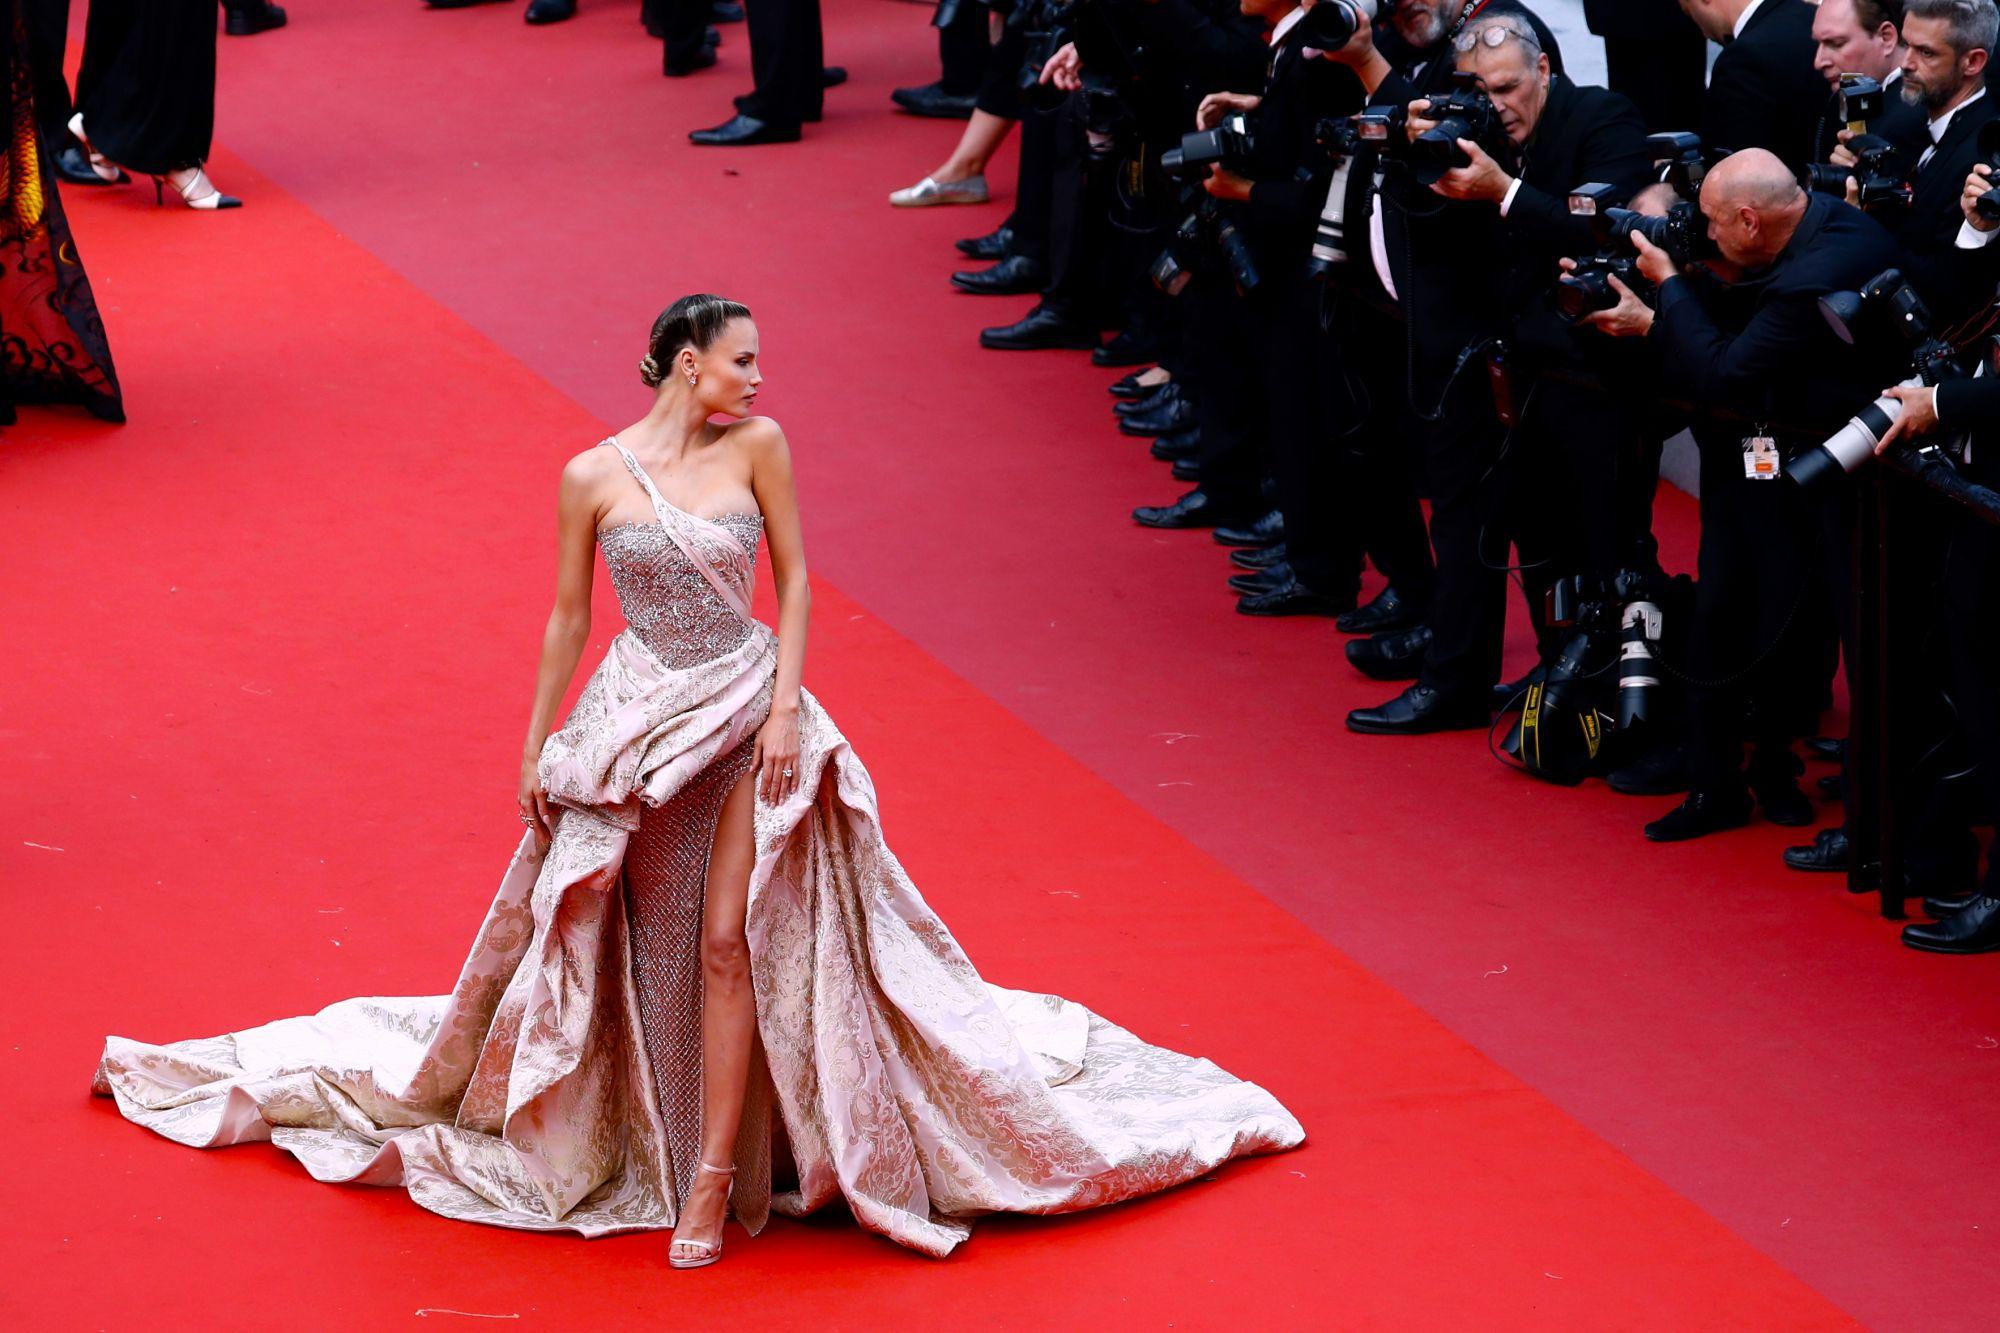 Best Picture Festival 2019 10 Best Dressed At The Cannes Film Festival 2019 | Hong Kong Tatler